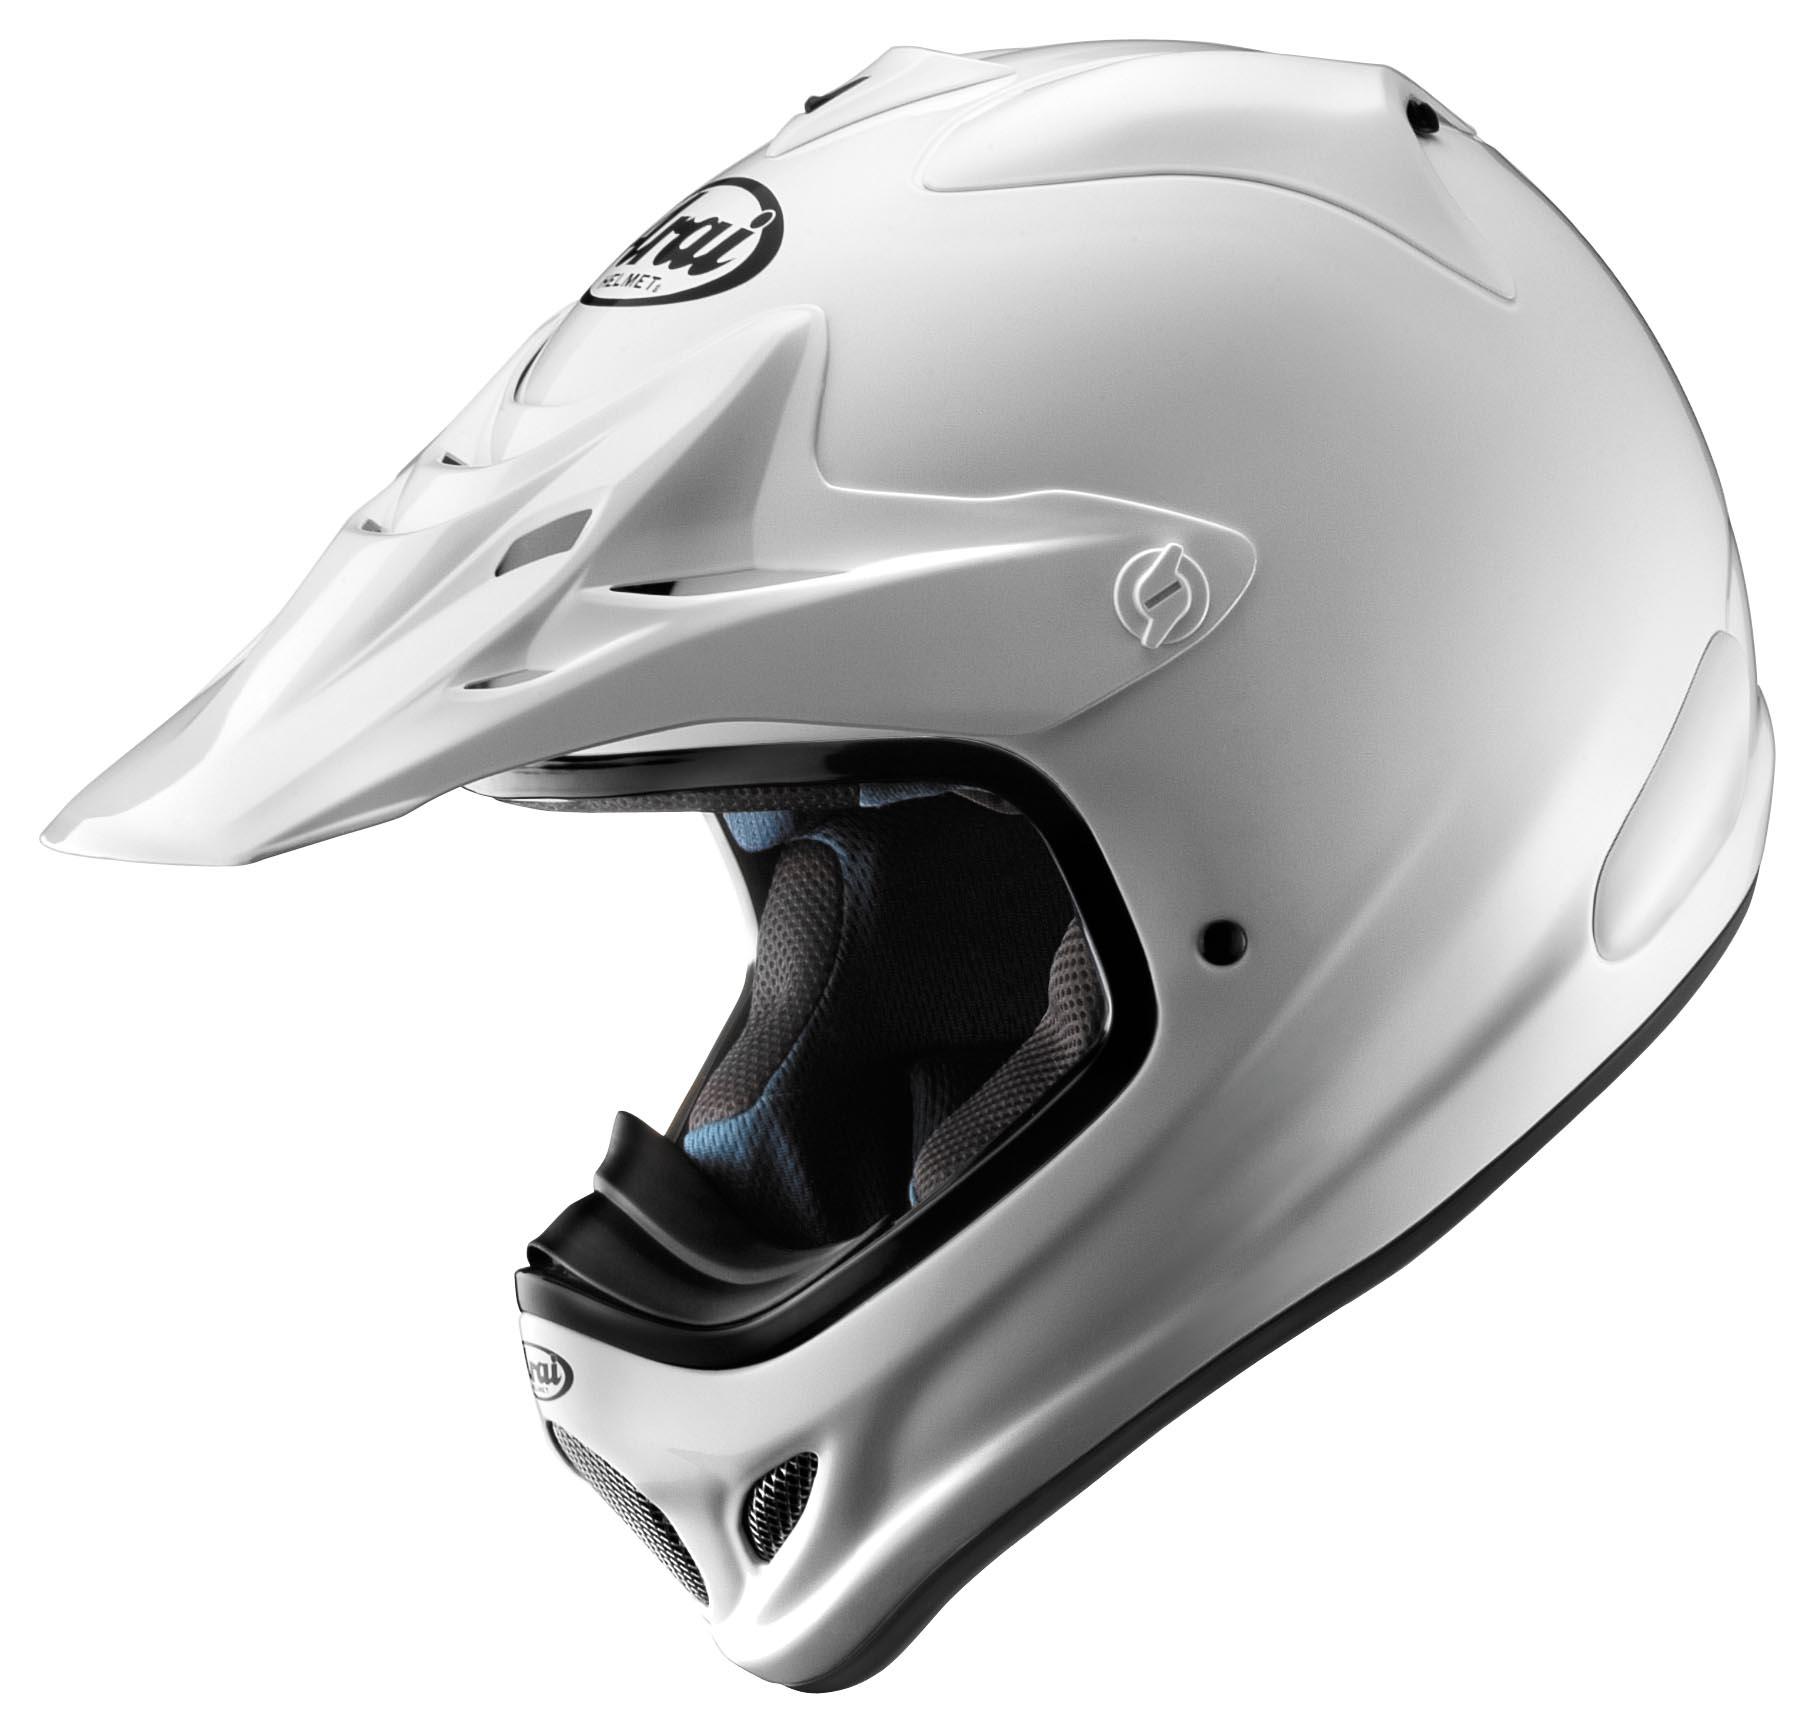 Arai Vx Pro 3 >> ARAI Visor for VX-Pro3 Helmet | eBay